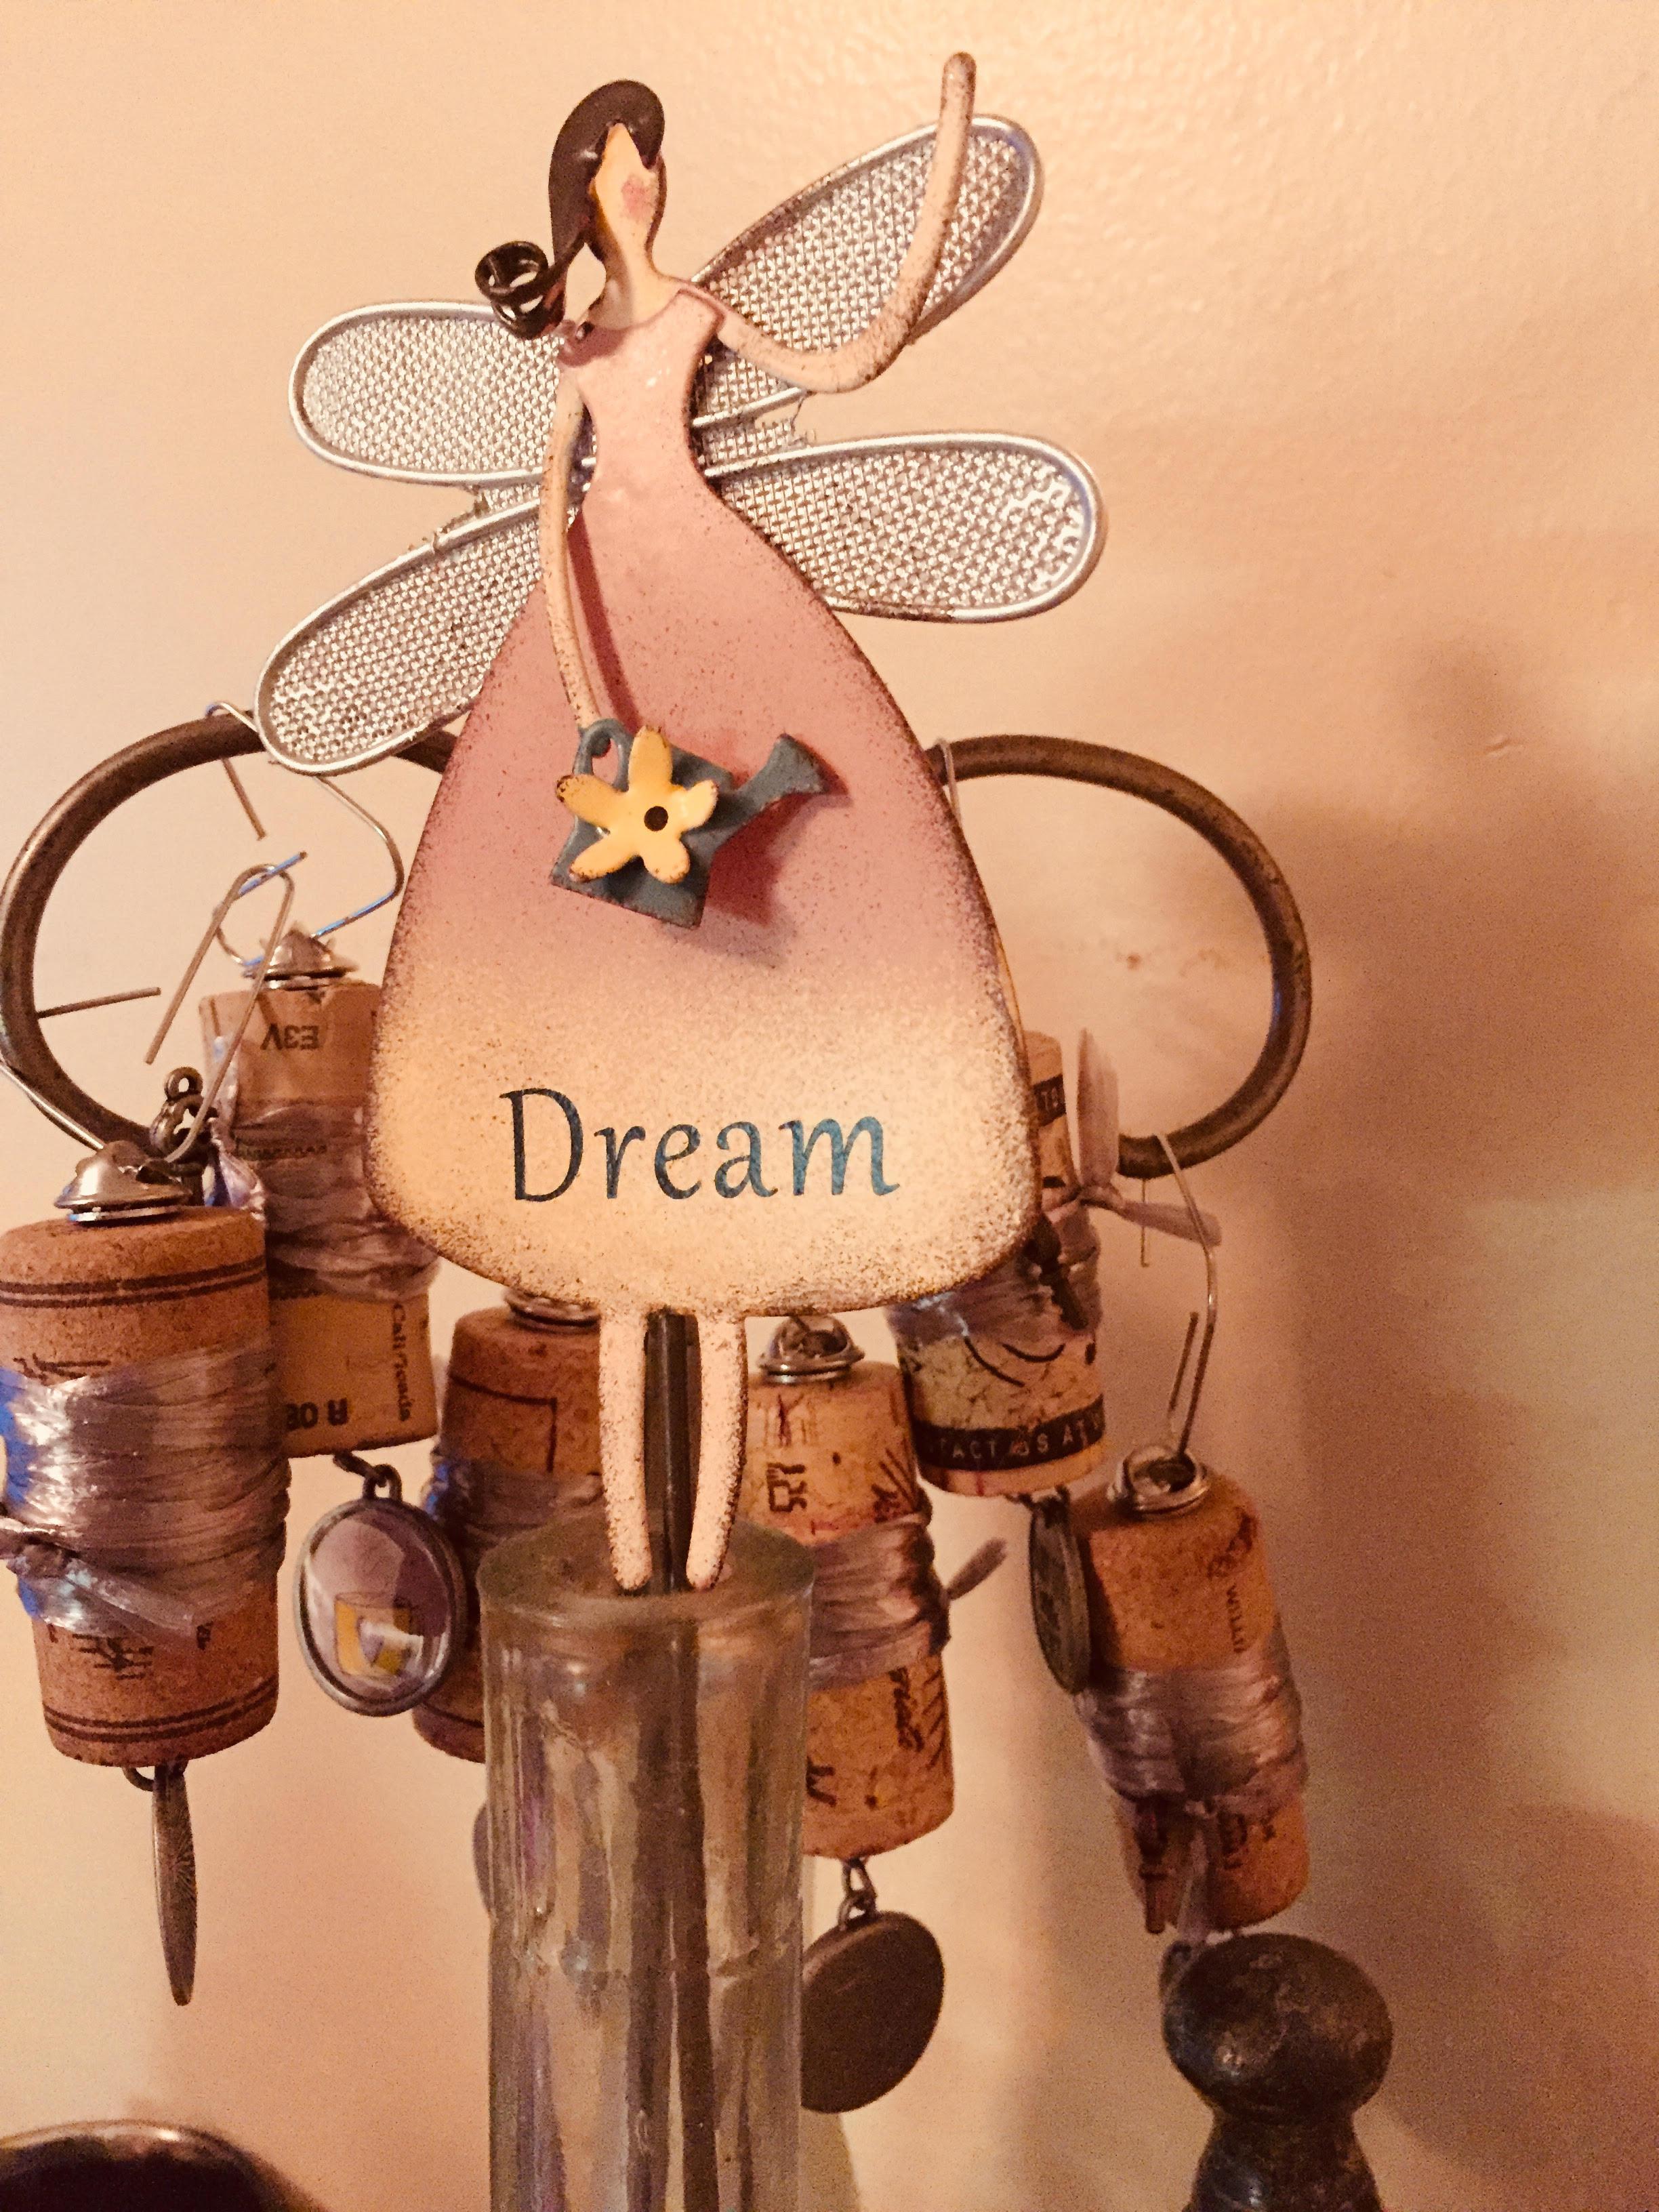 Dream Girl with corks.jpg